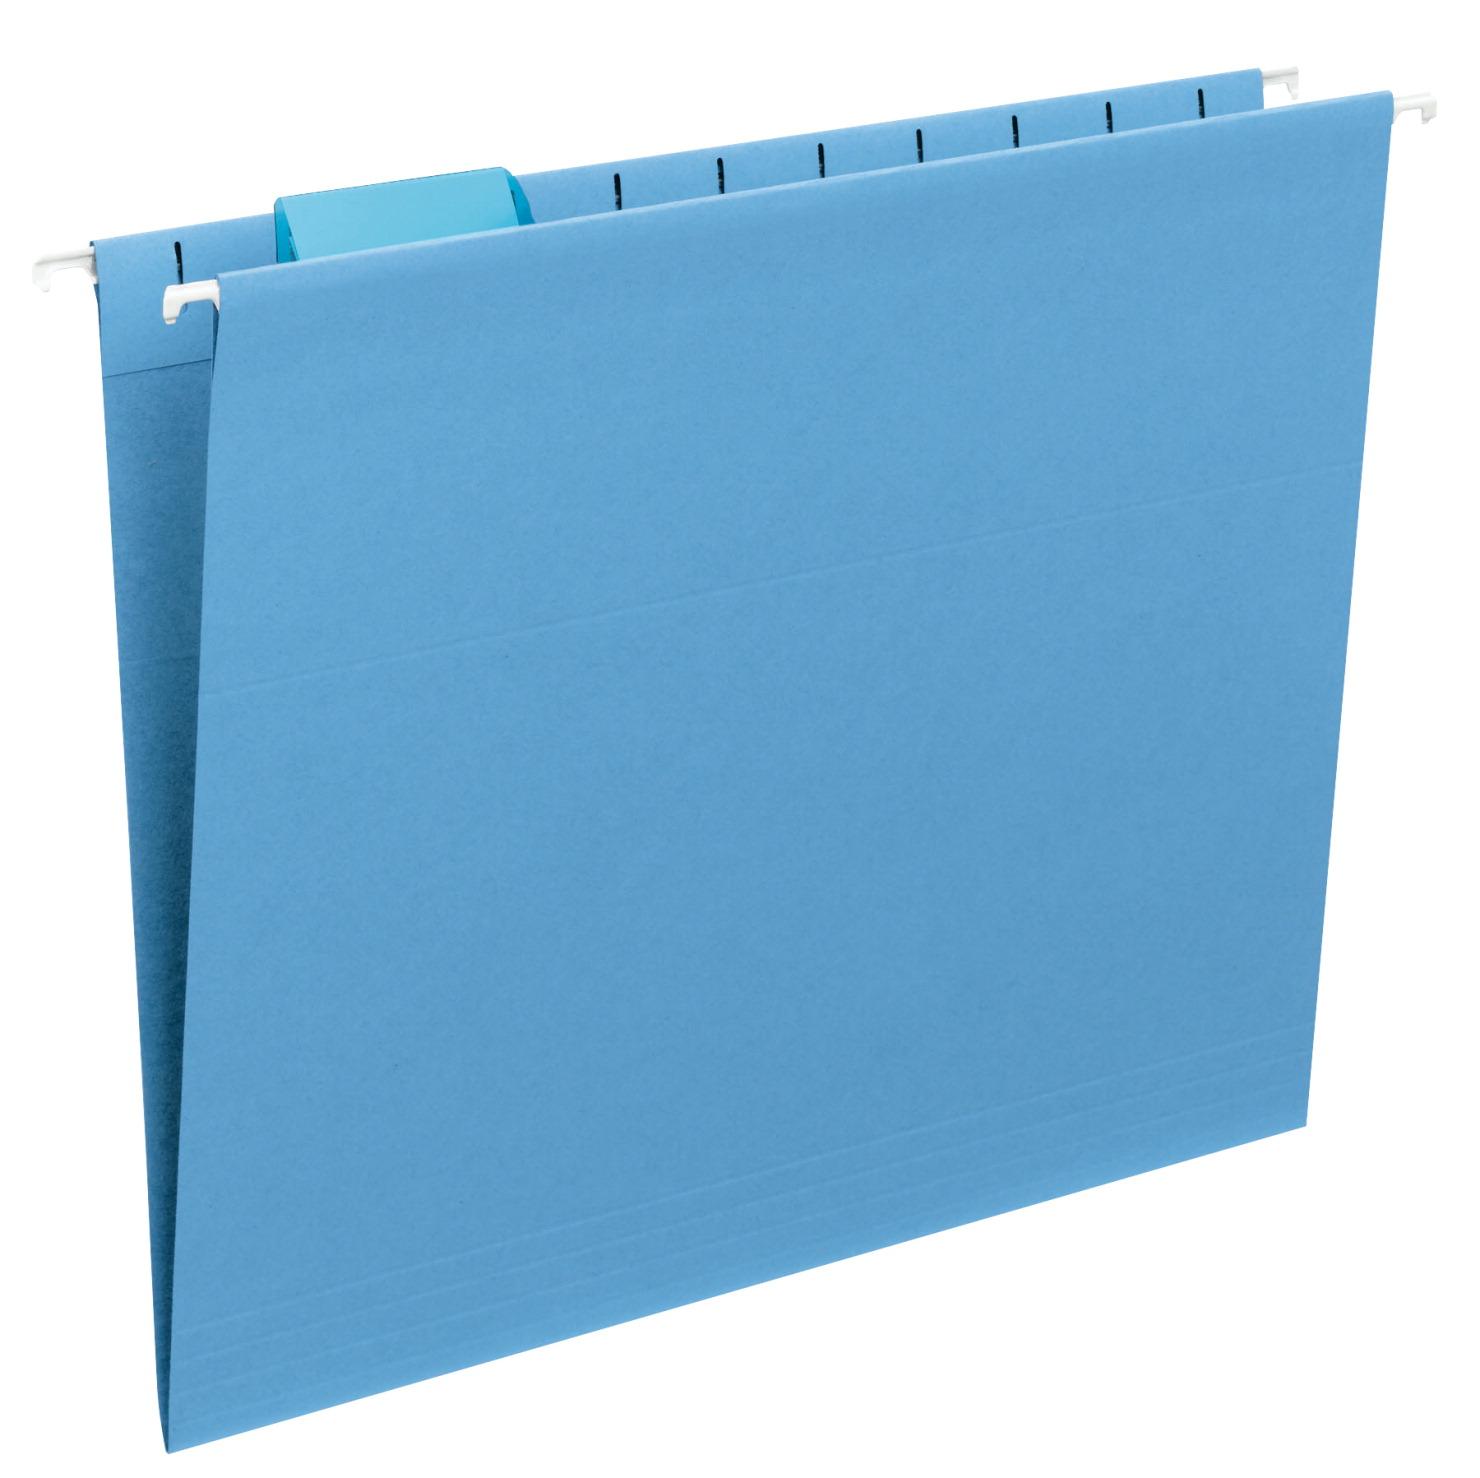 Hanging Folder School Specialty Marketplace